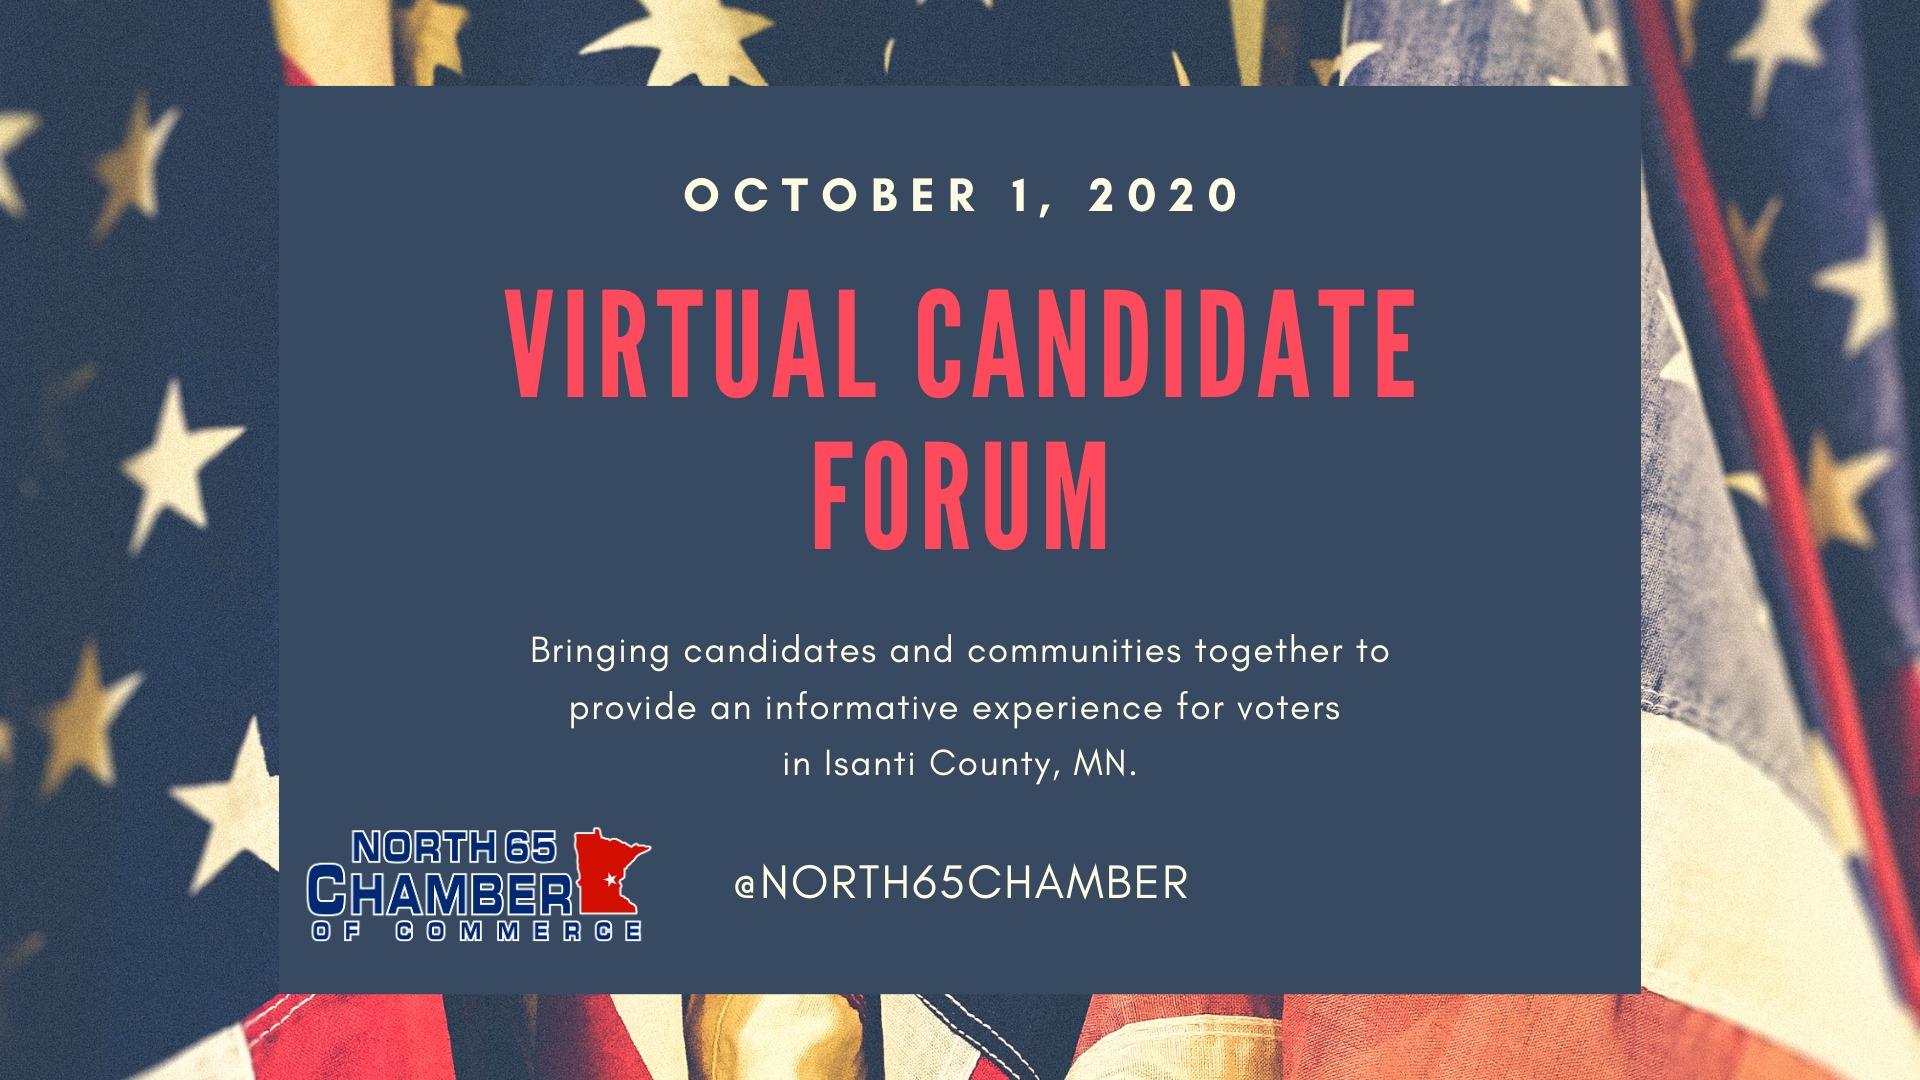 virtual candidate forum october 1